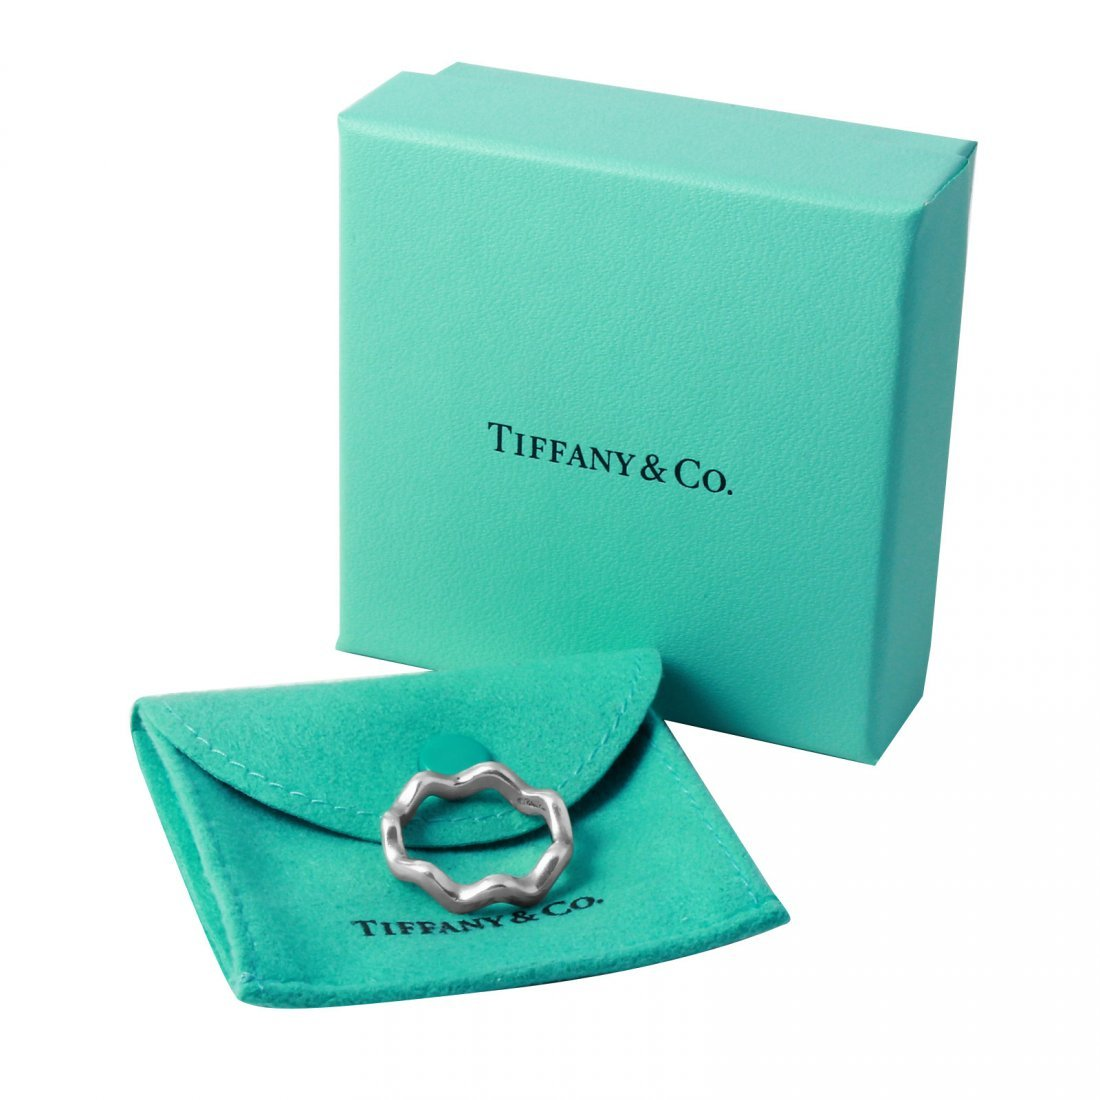 Tiffany & Co: Paloma Picasso Zig Zag Ring, Size 7.5 - 3